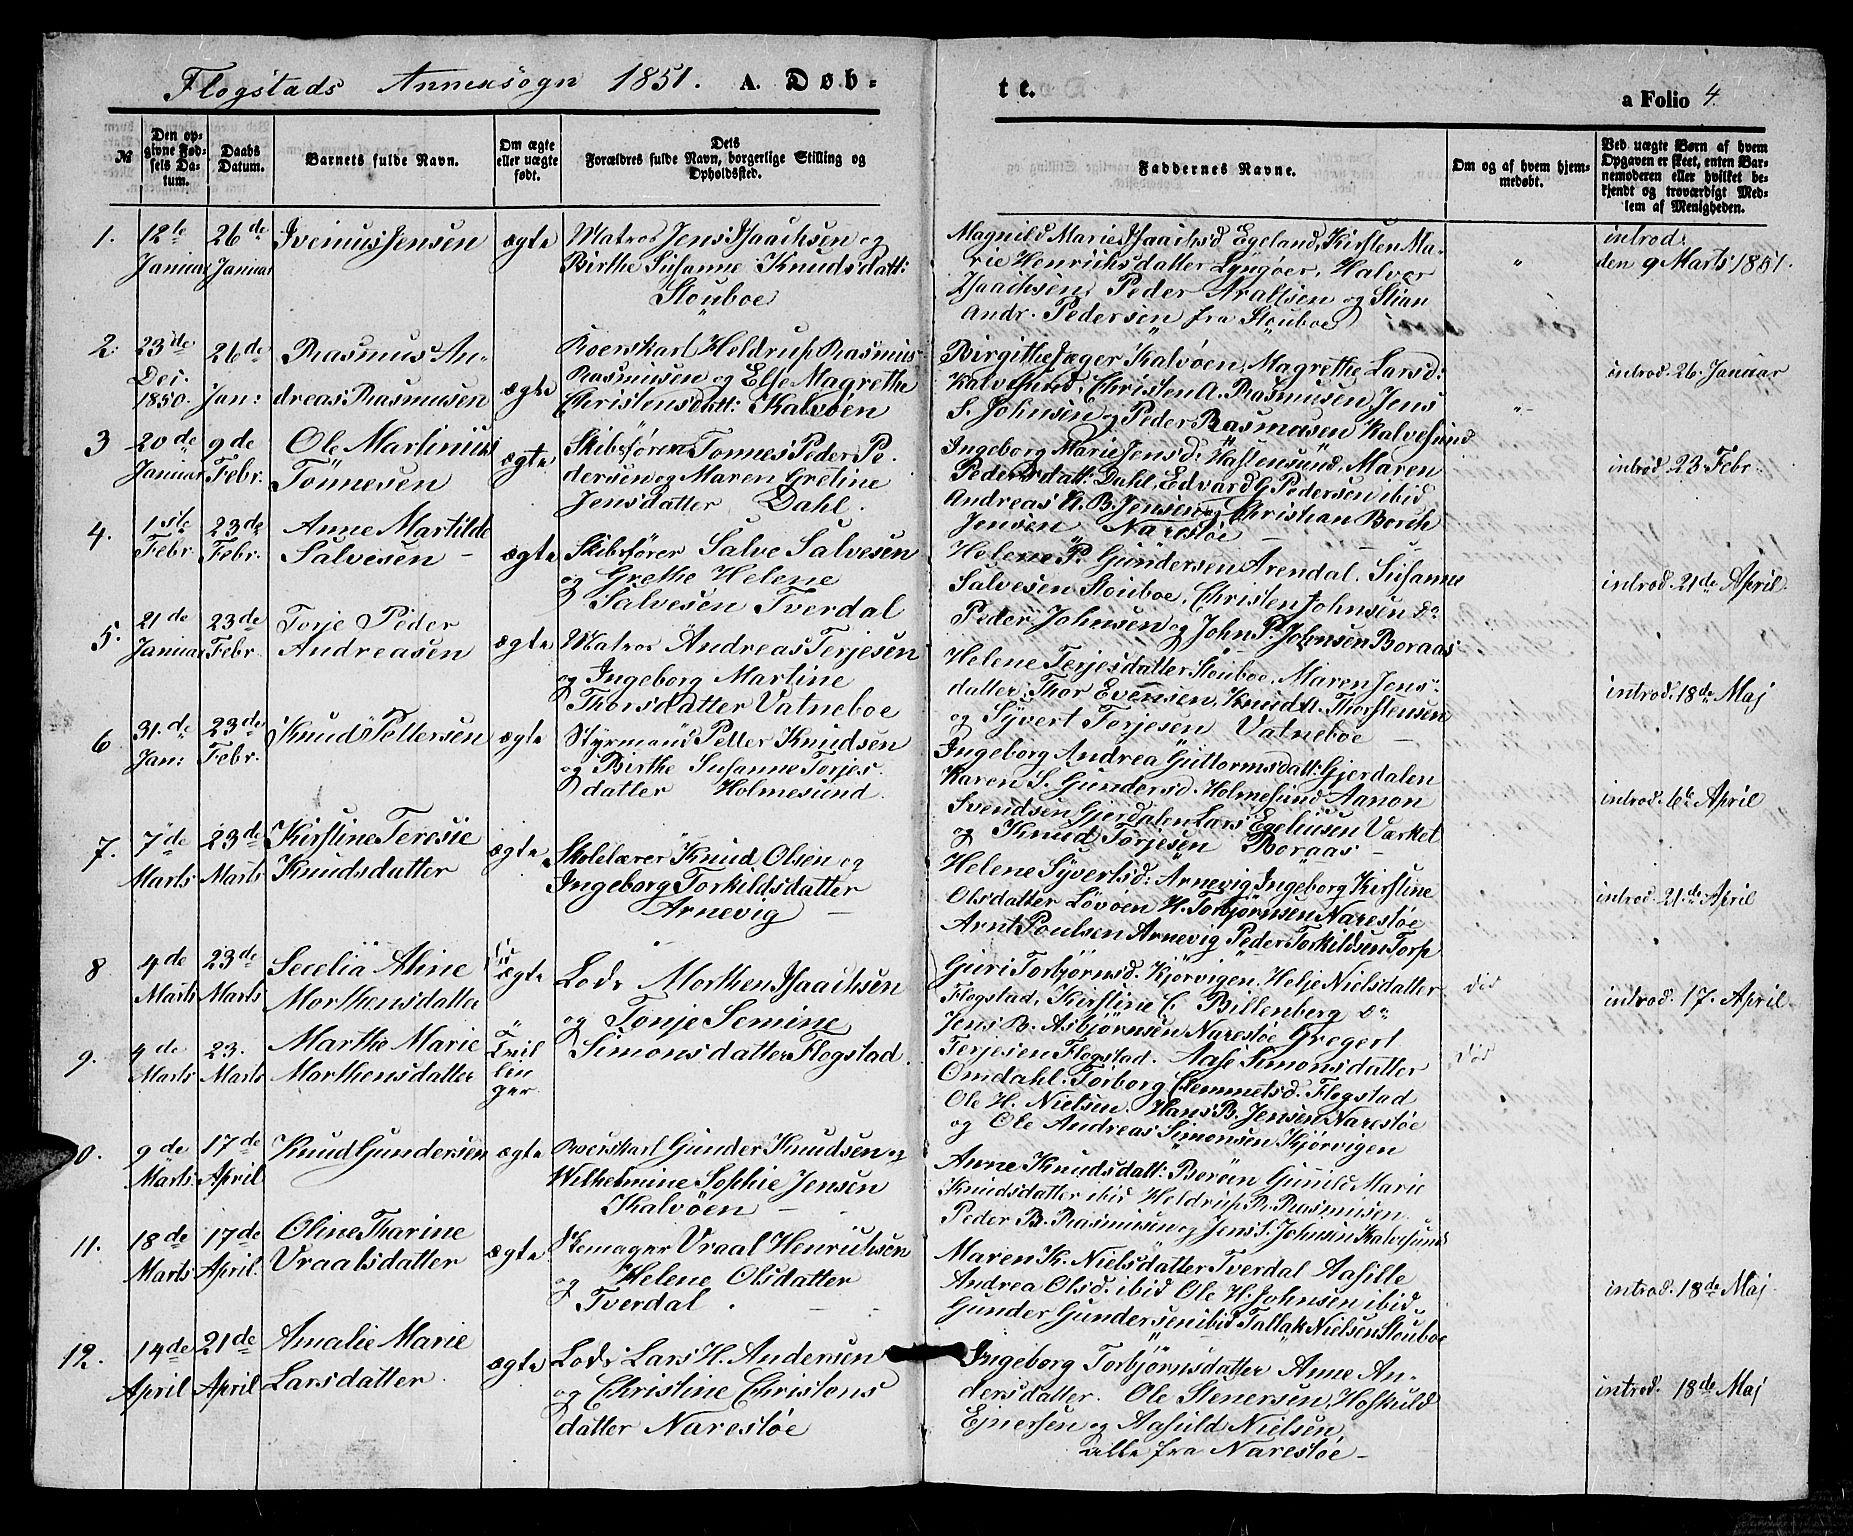 SAK, Dypvåg sokneprestkontor, F/Fb/Fbb/L0002: Klokkerbok nr. B 2, 1851-1871, s. 4